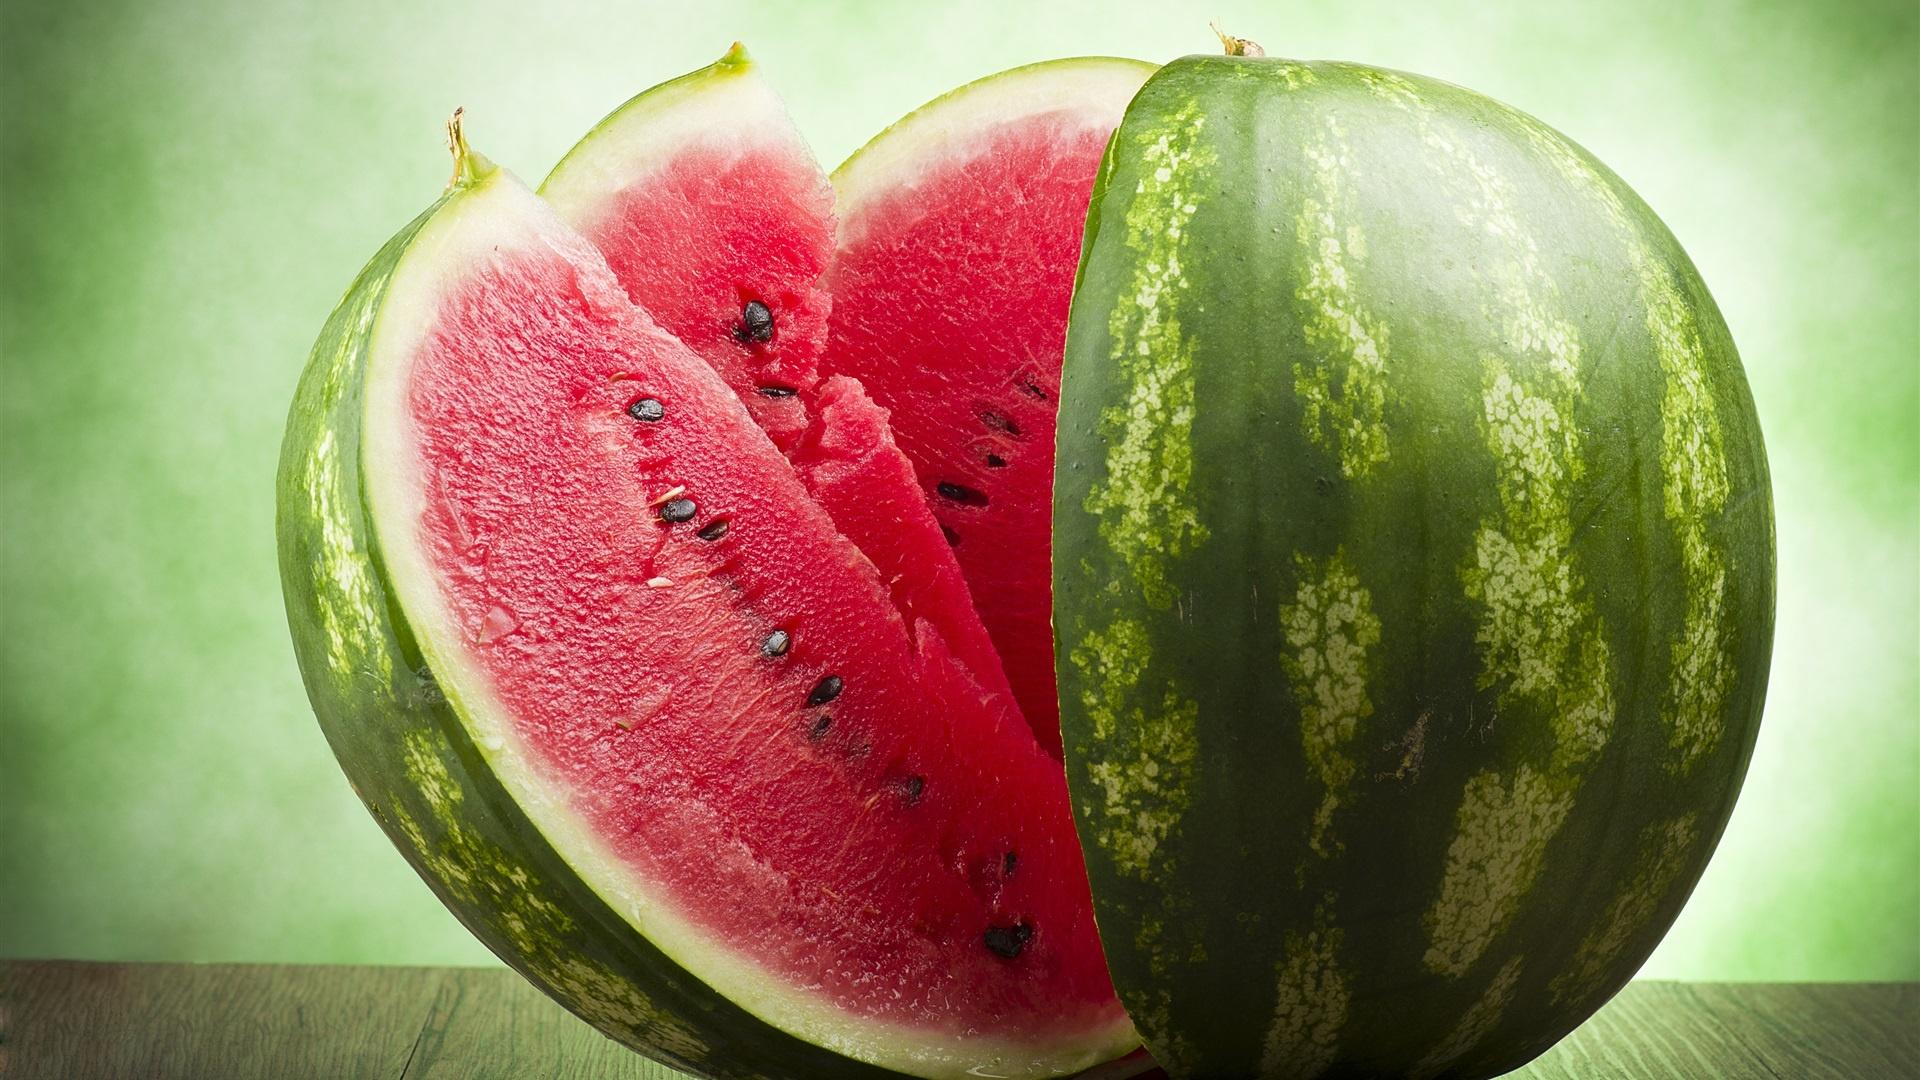 Watermelon hd wallpaper 1080